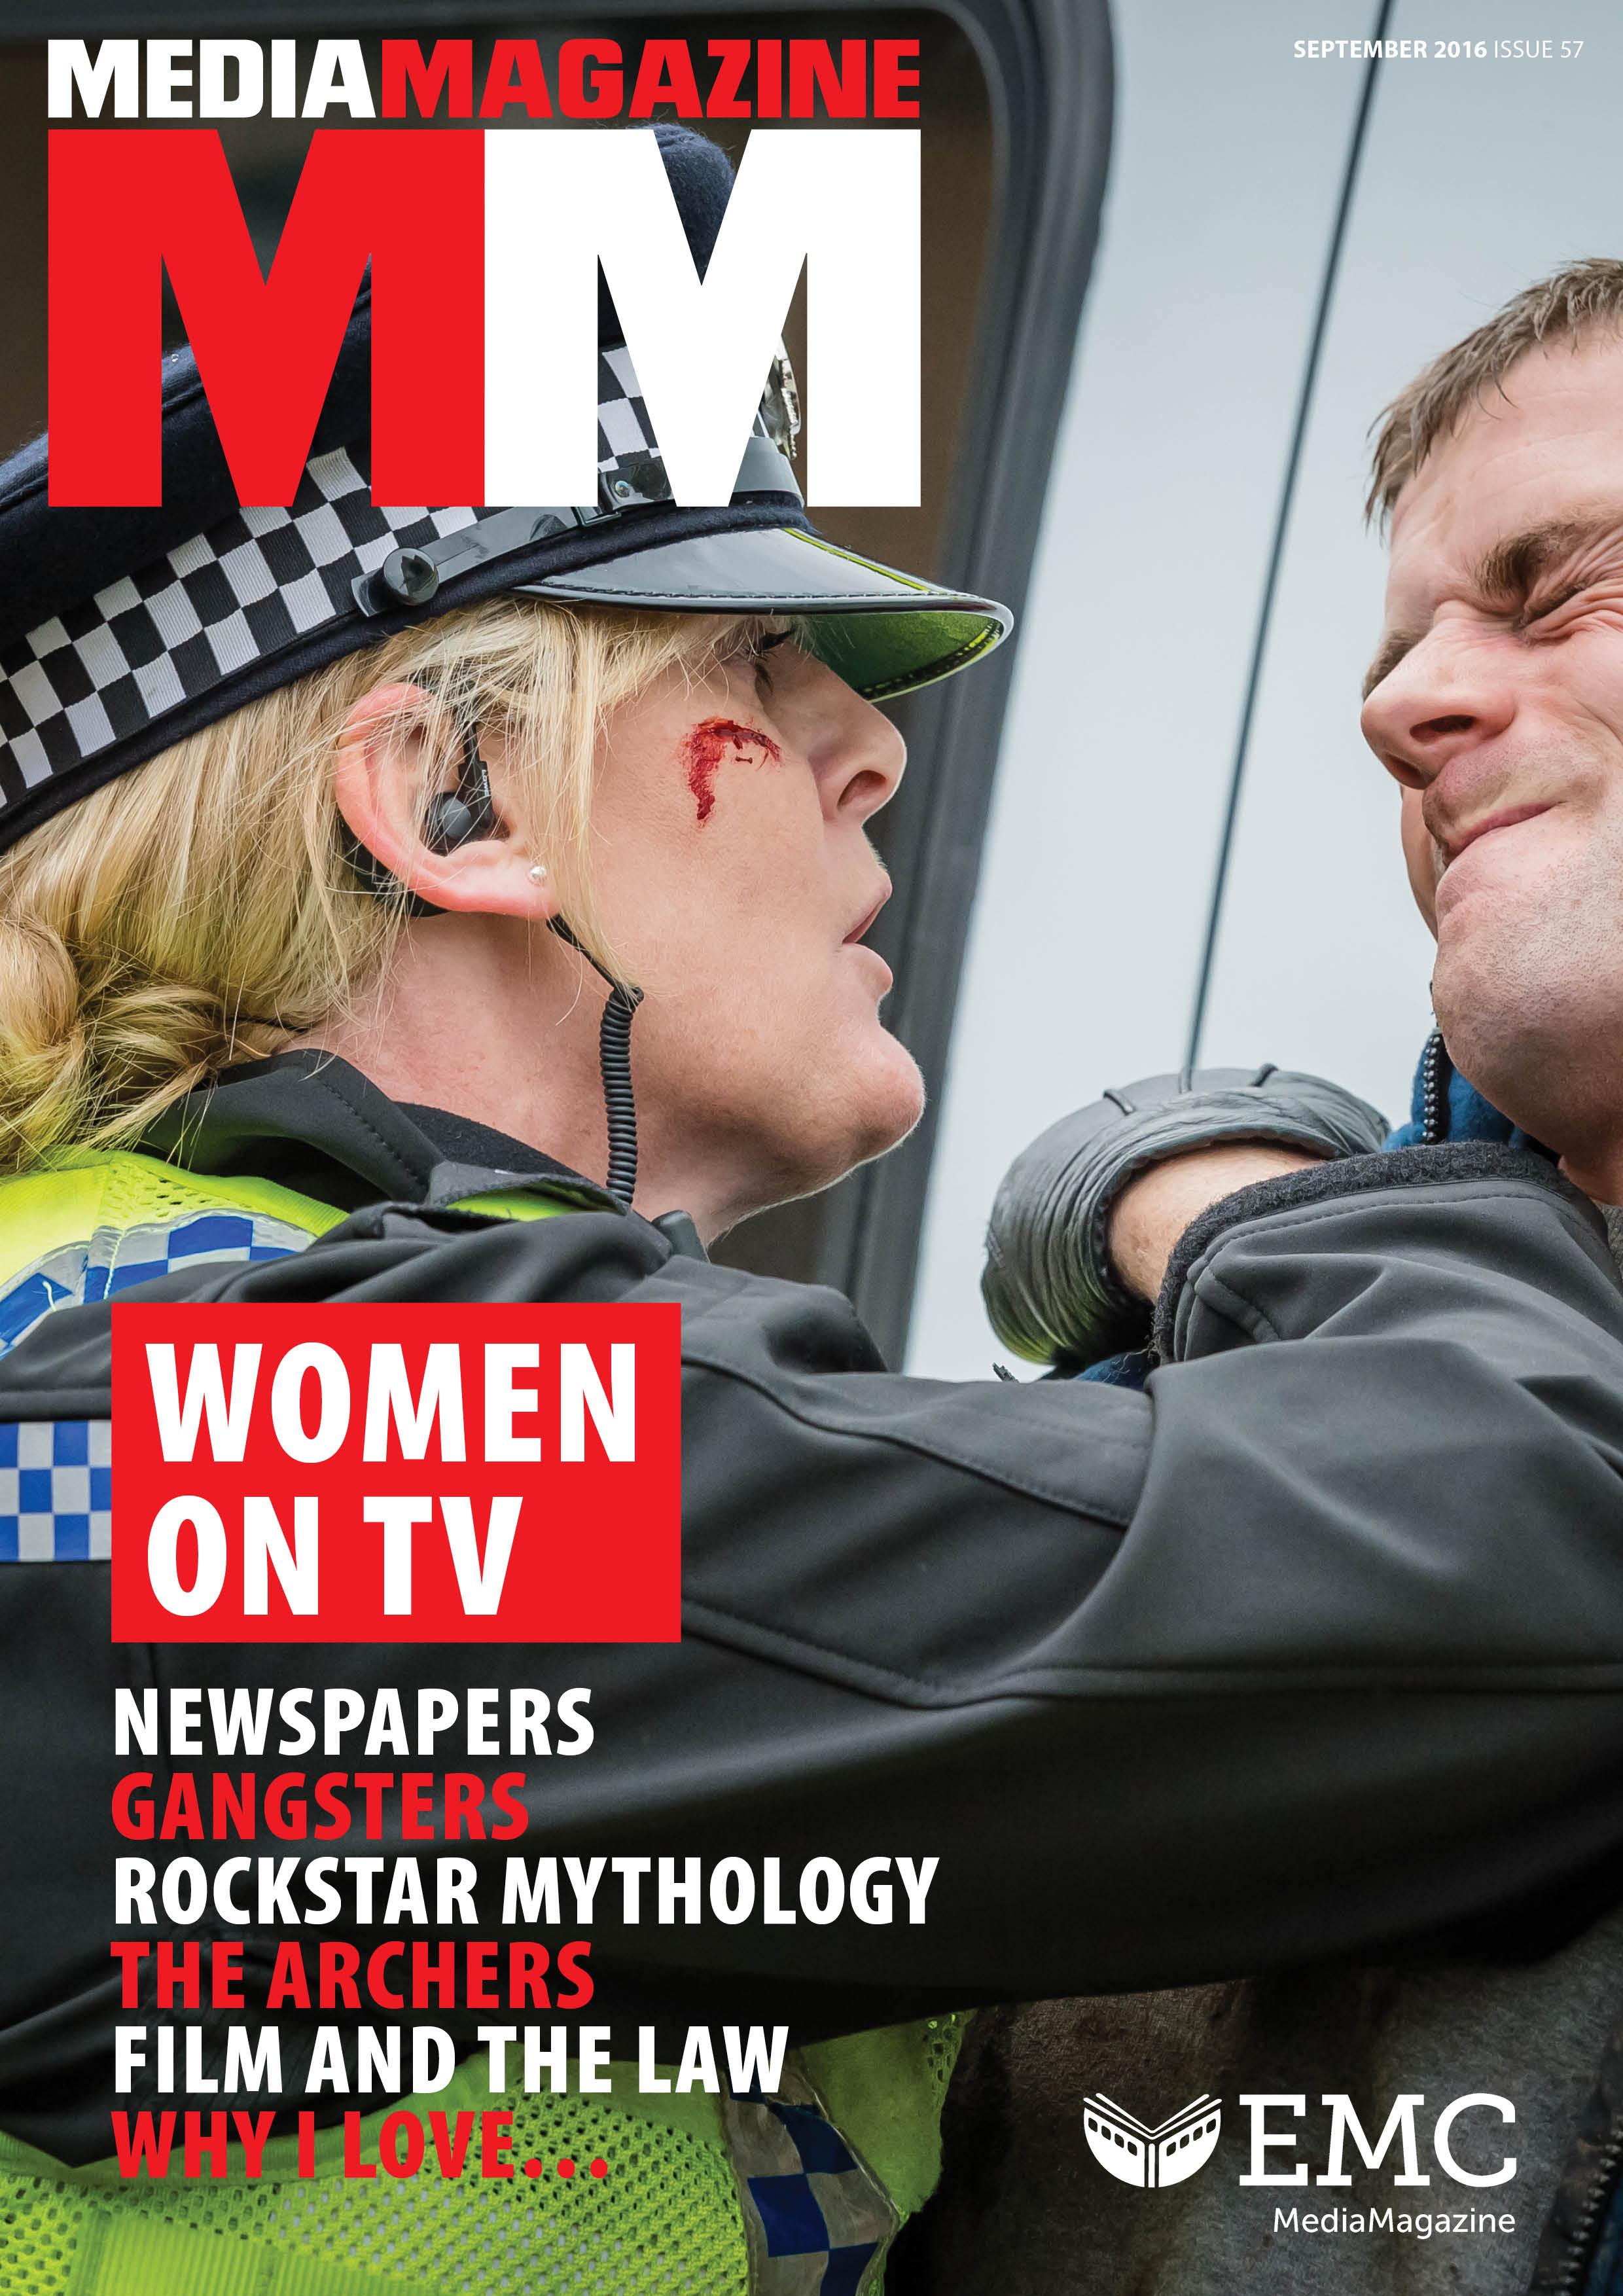 MediaMagazine 57 front cover